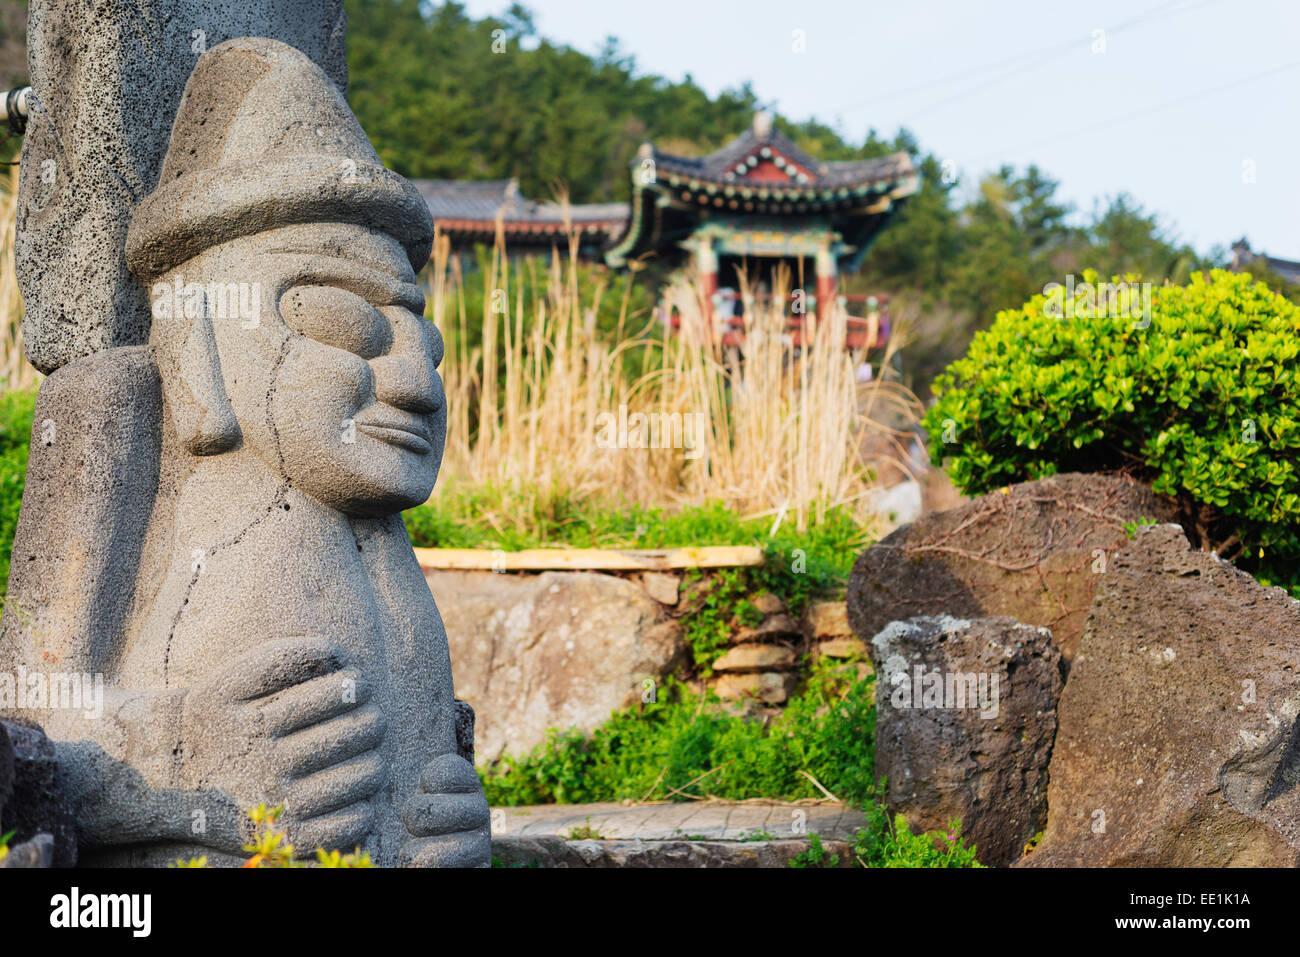 Dol Hareubang (Harubang) Schutz und Fruchtbarkeit-Statue am Sanbanggulsa Tempel, Insel Jeju, Südkorea, Asien Stockbild